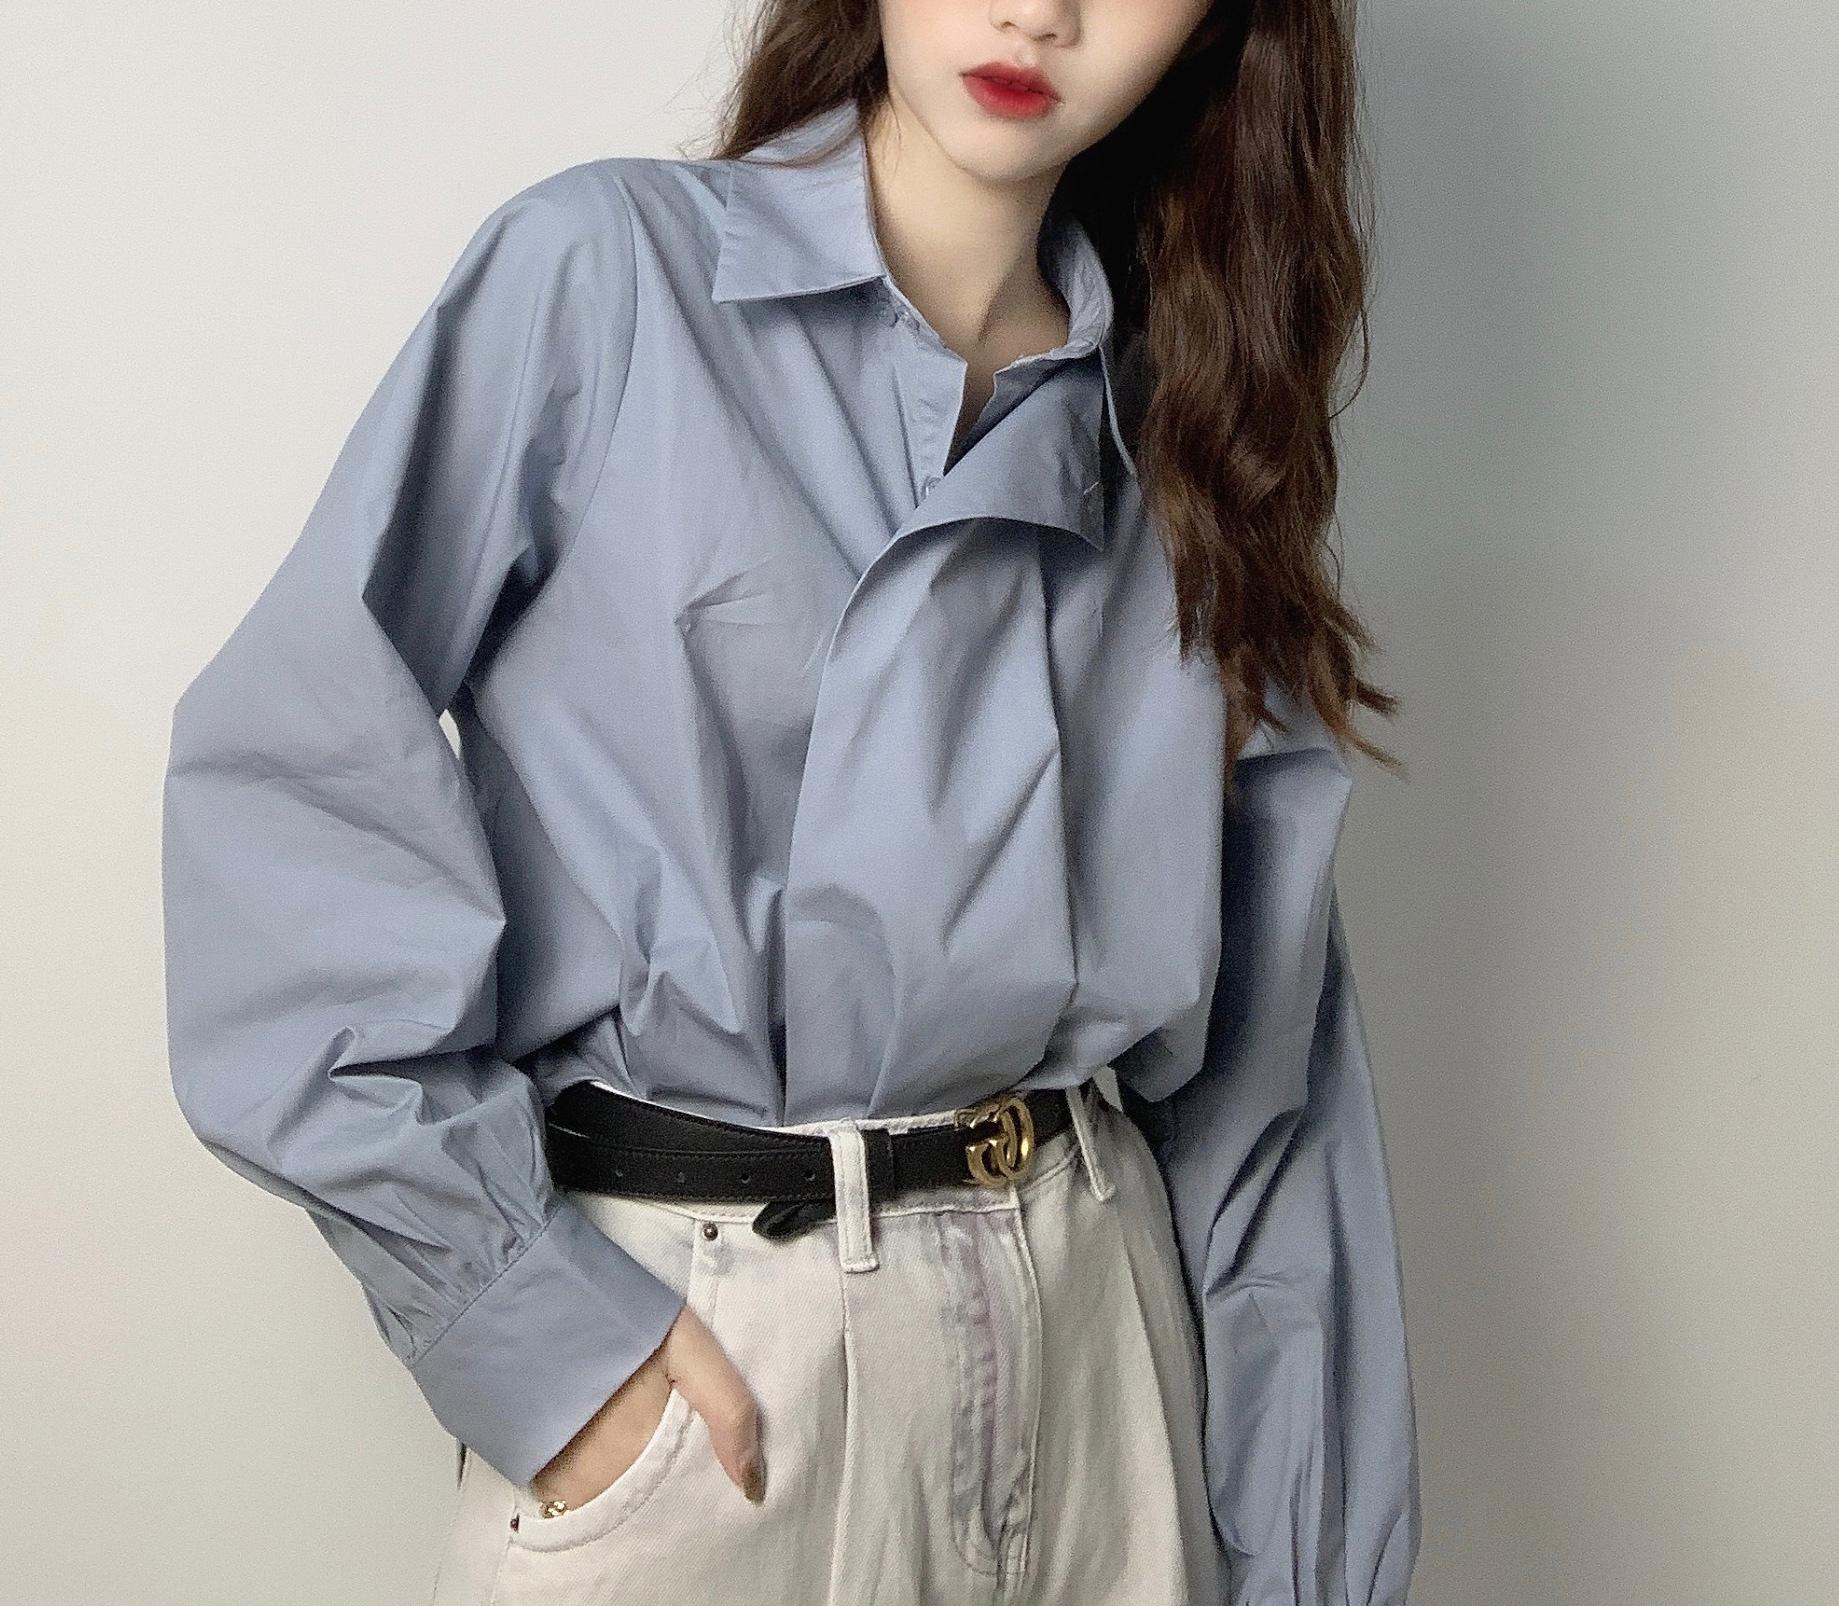 French shirt womens sense of design niche 2020 new temperament Lapel net version loose long sleeve shirt retro Hong Kong Style